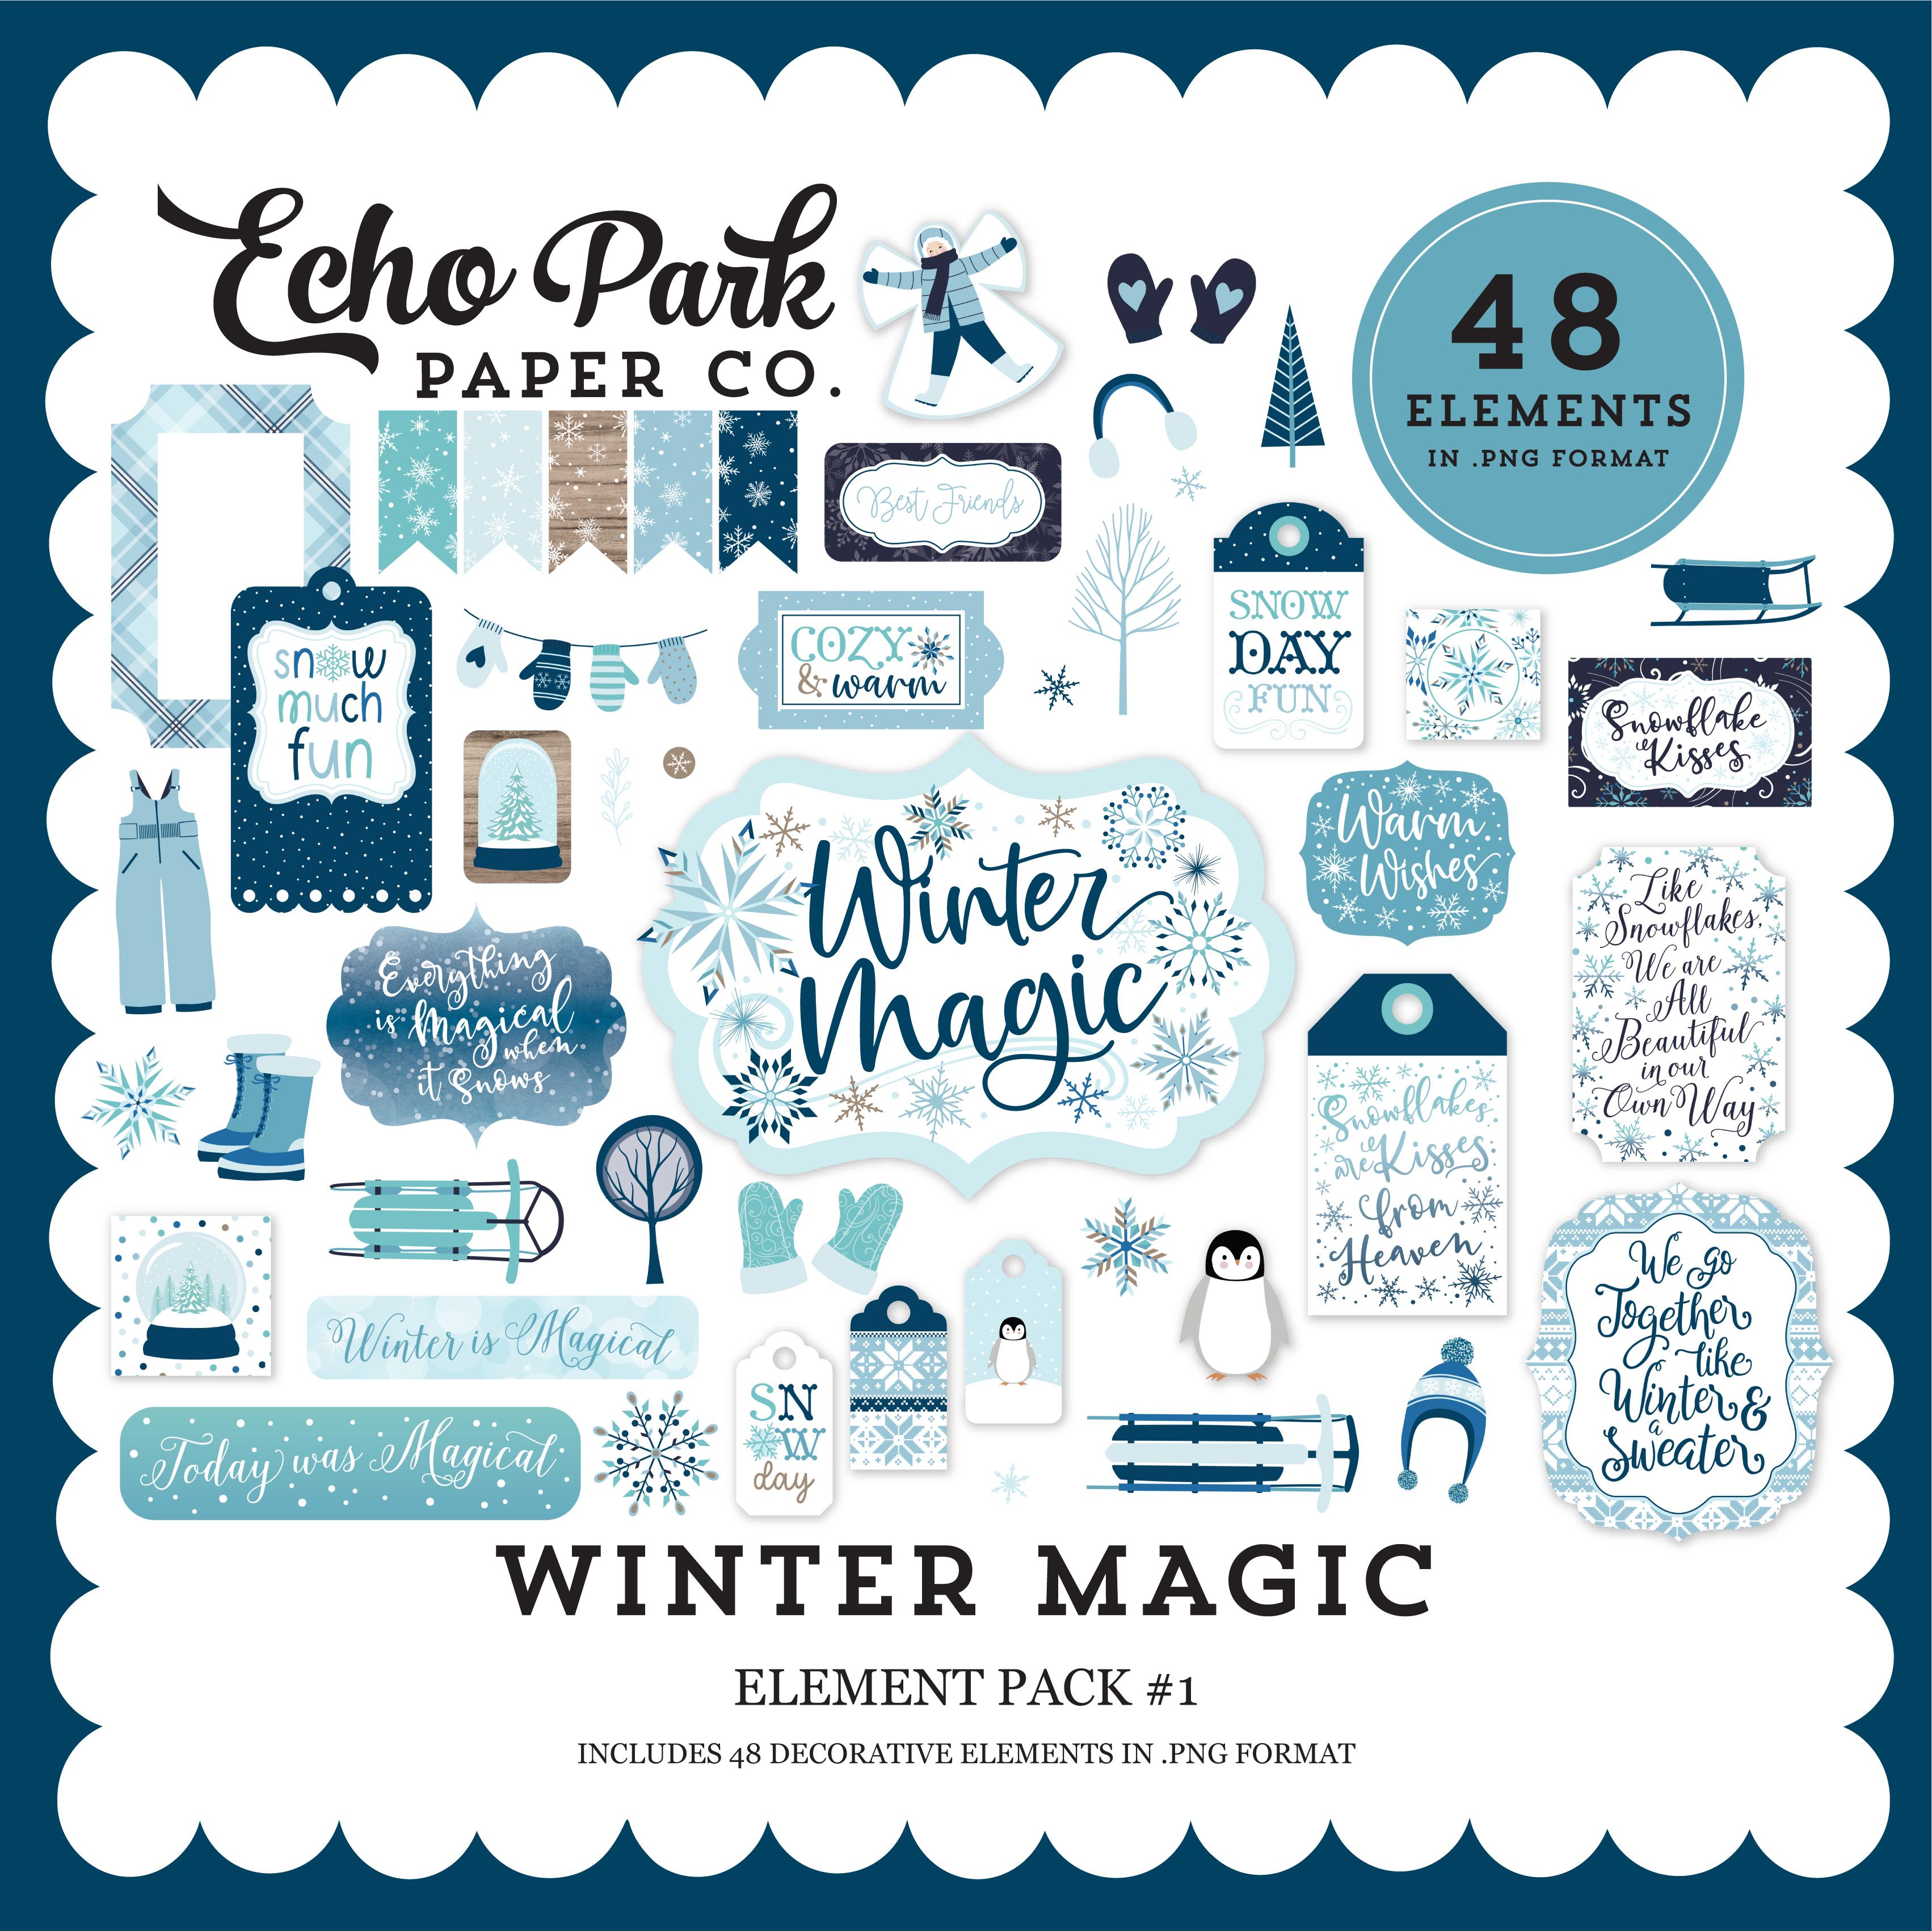 Winter Magic Element Pack #1